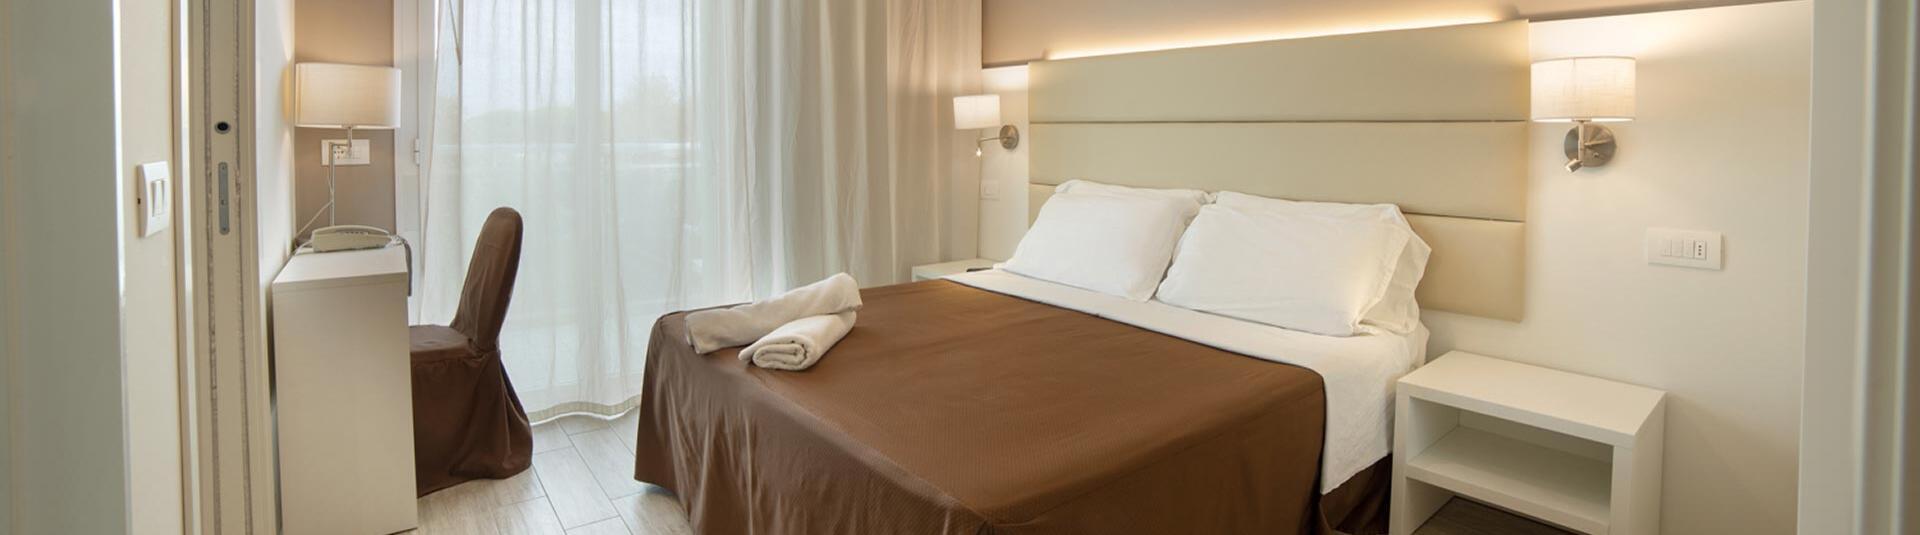 hotelacquamarina en rooms-hotel-riccione 004